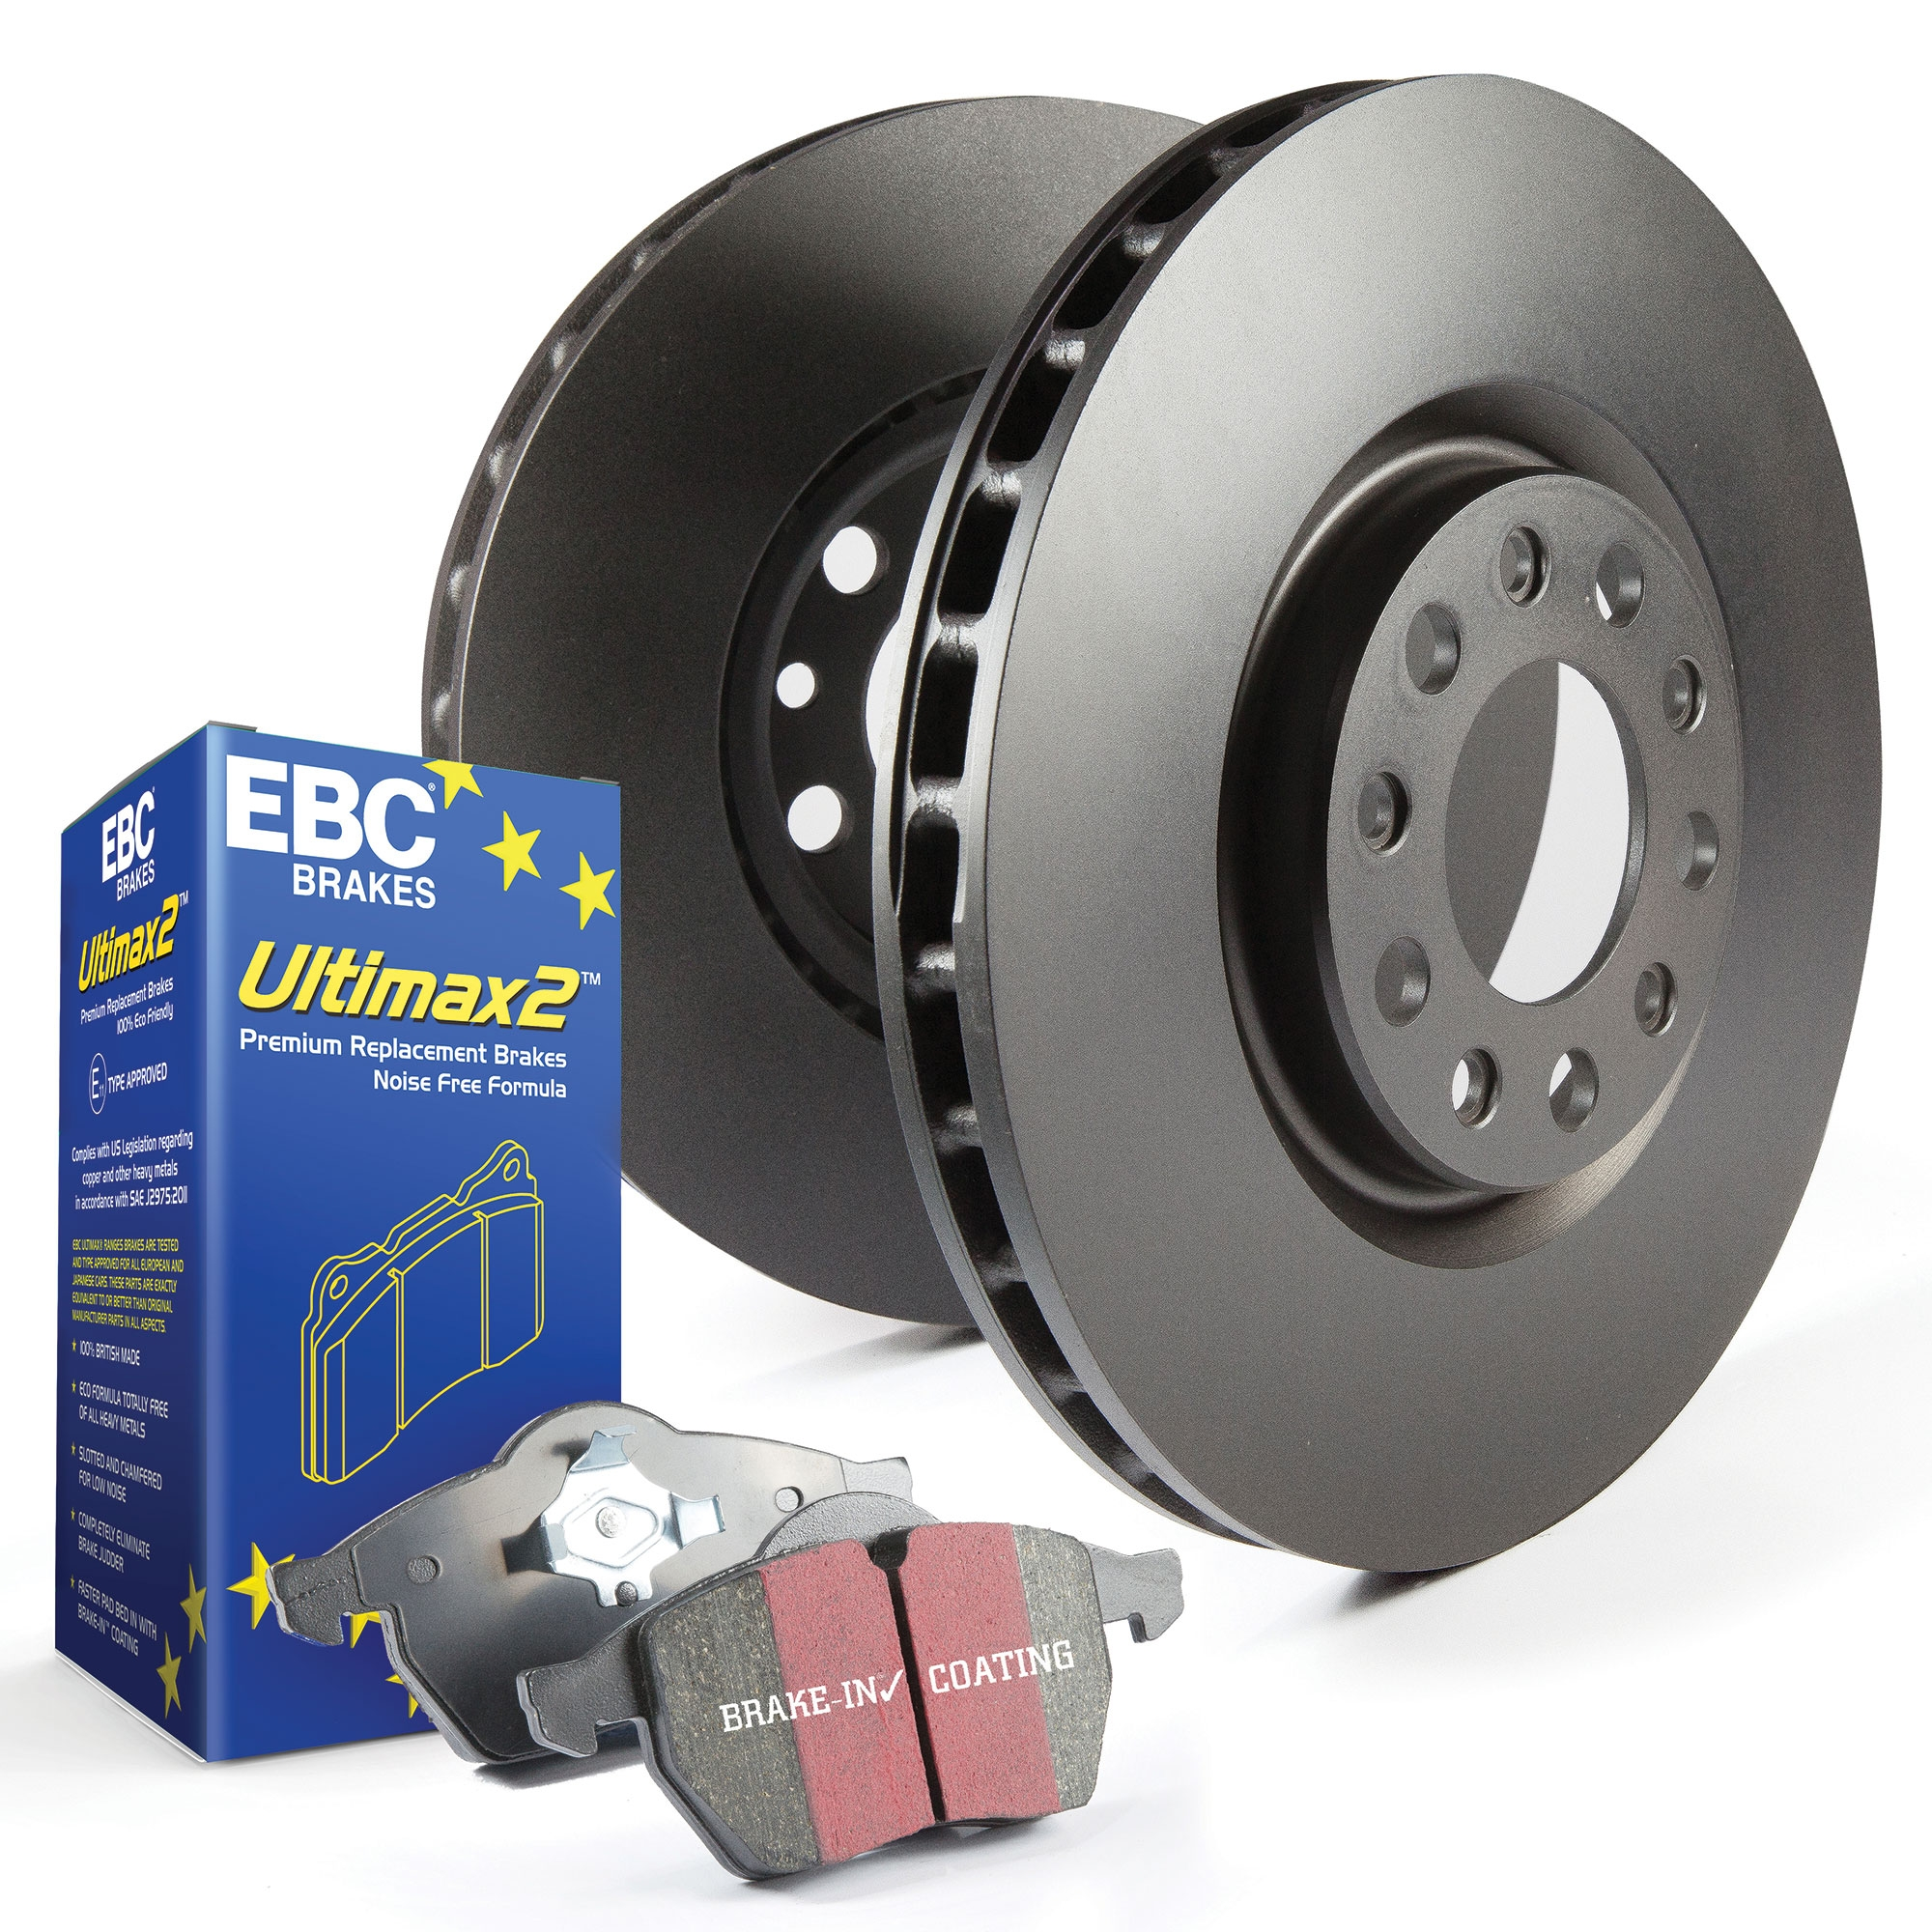 Civic Type R Ep3 Rear Grooved Brake Discs EBC Ultimax Brake Pads